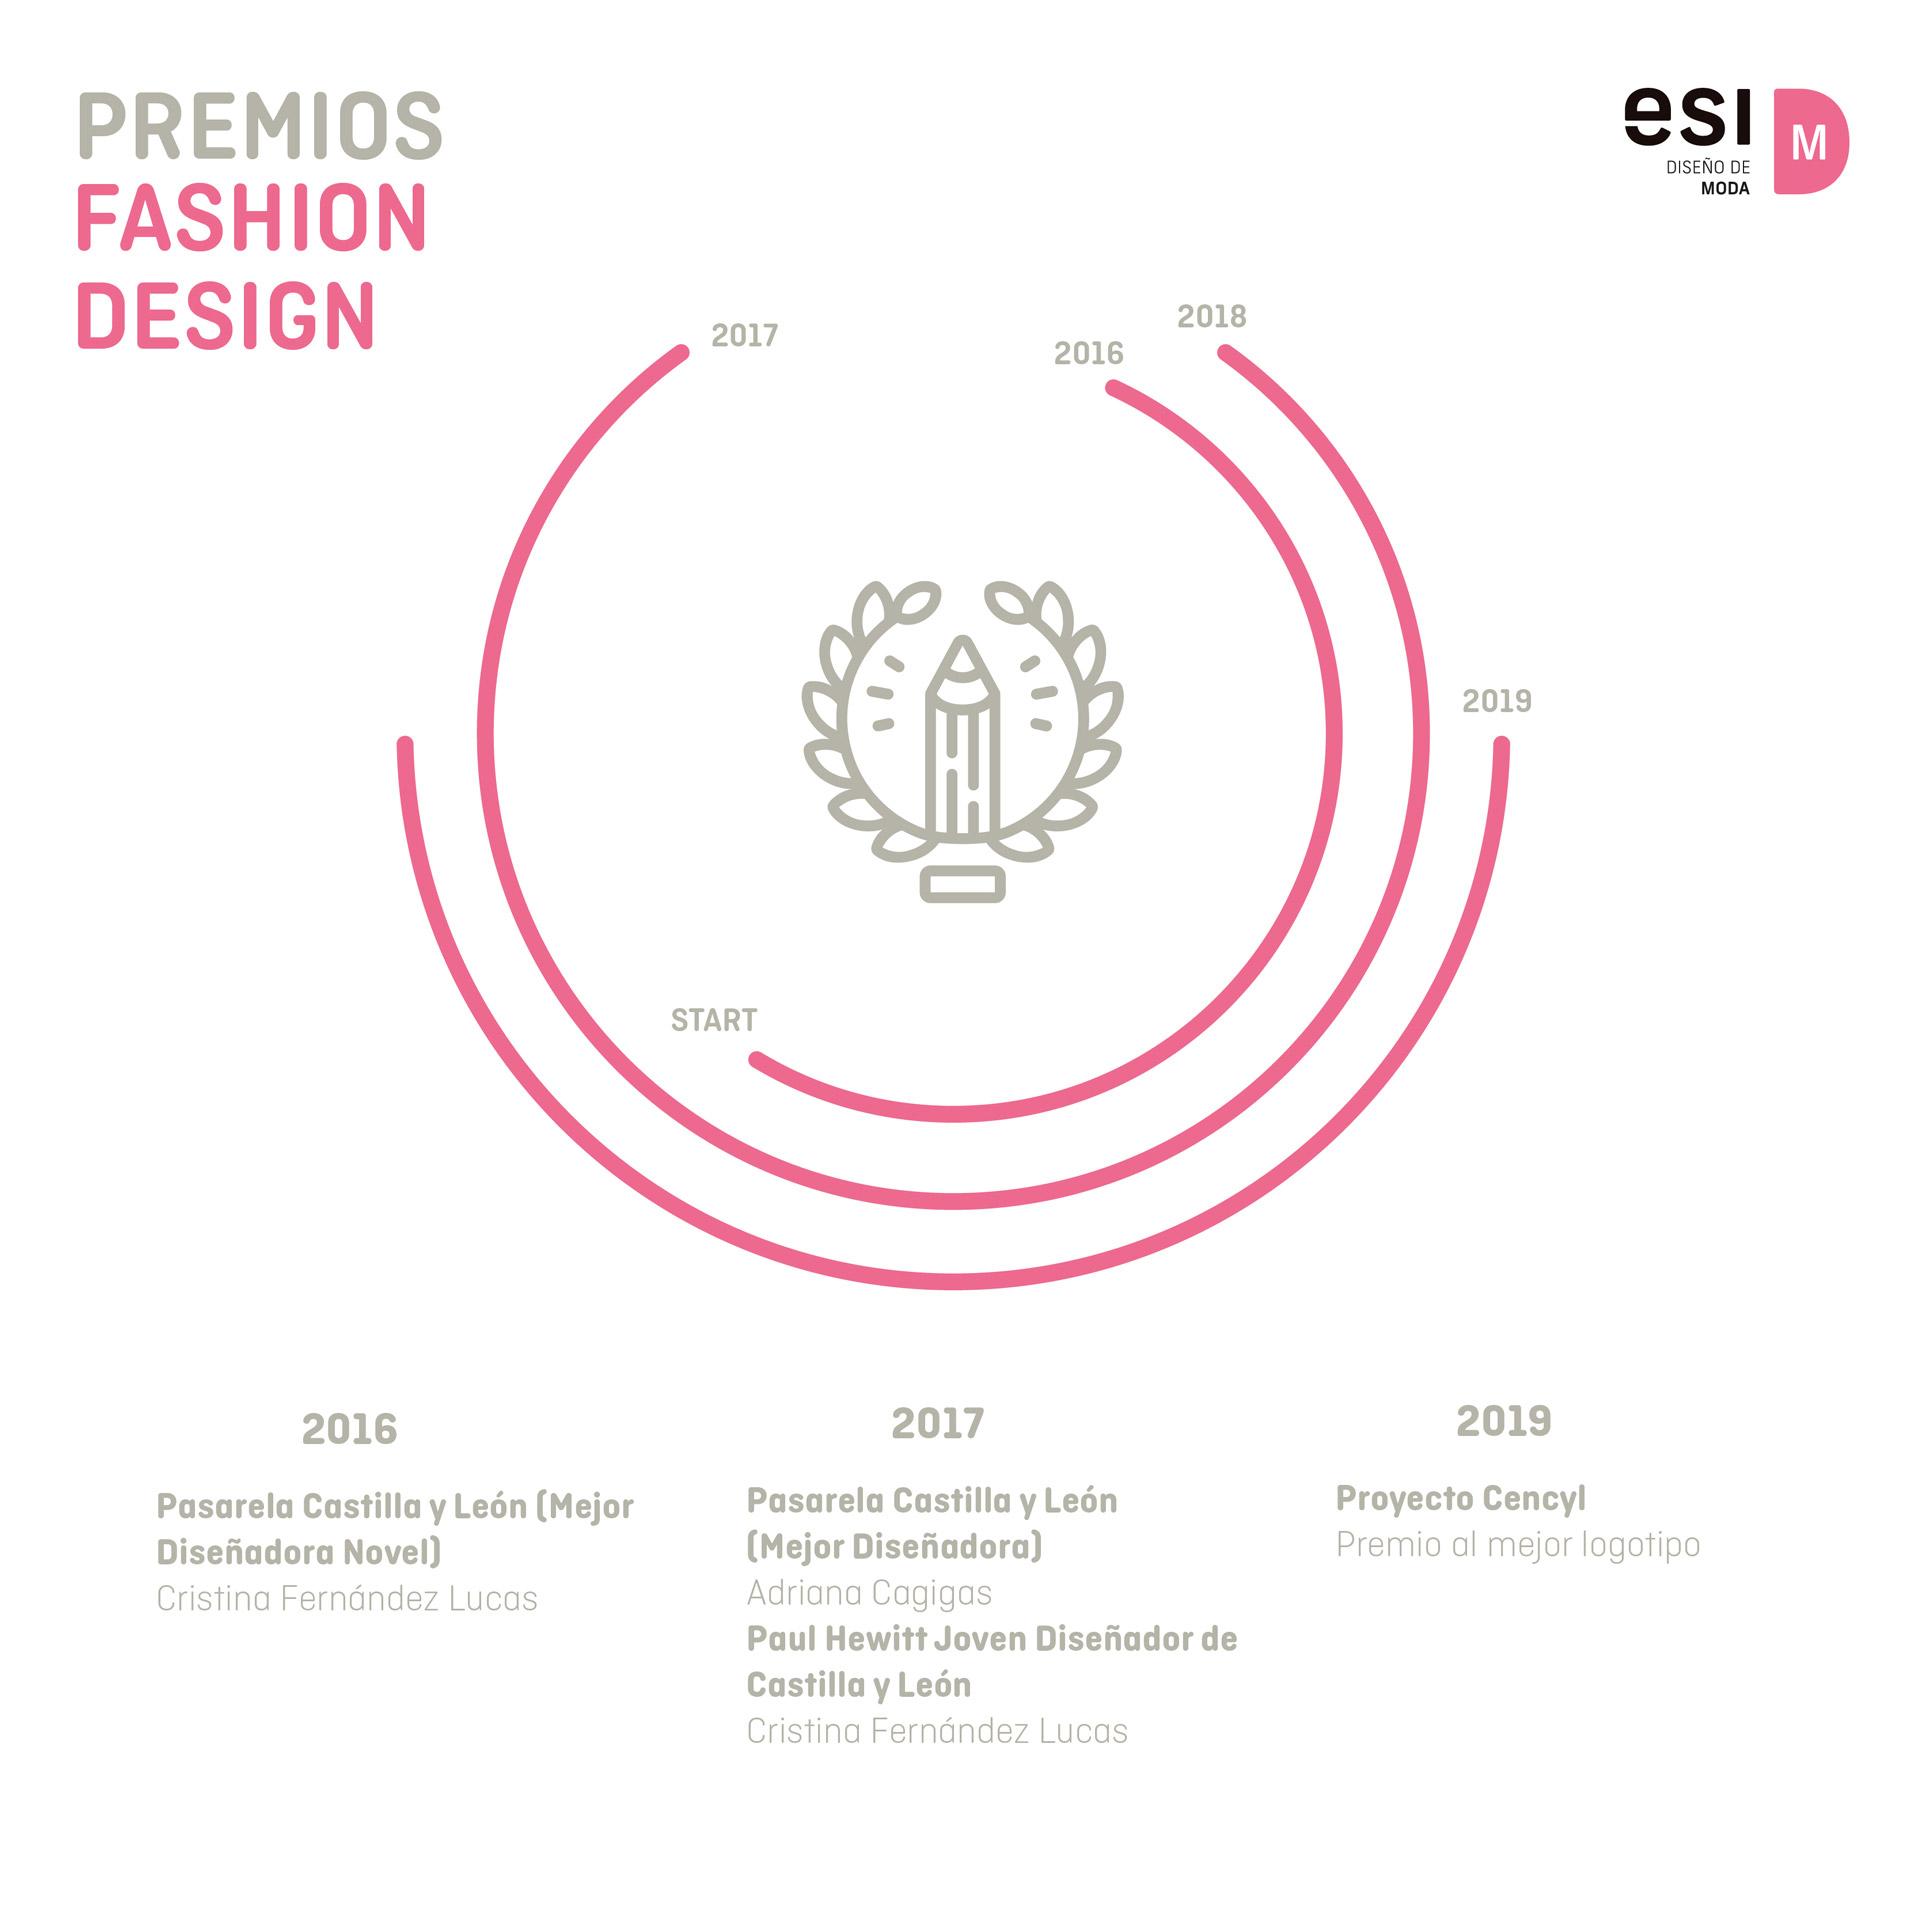 Premios Fashion Design Detalle